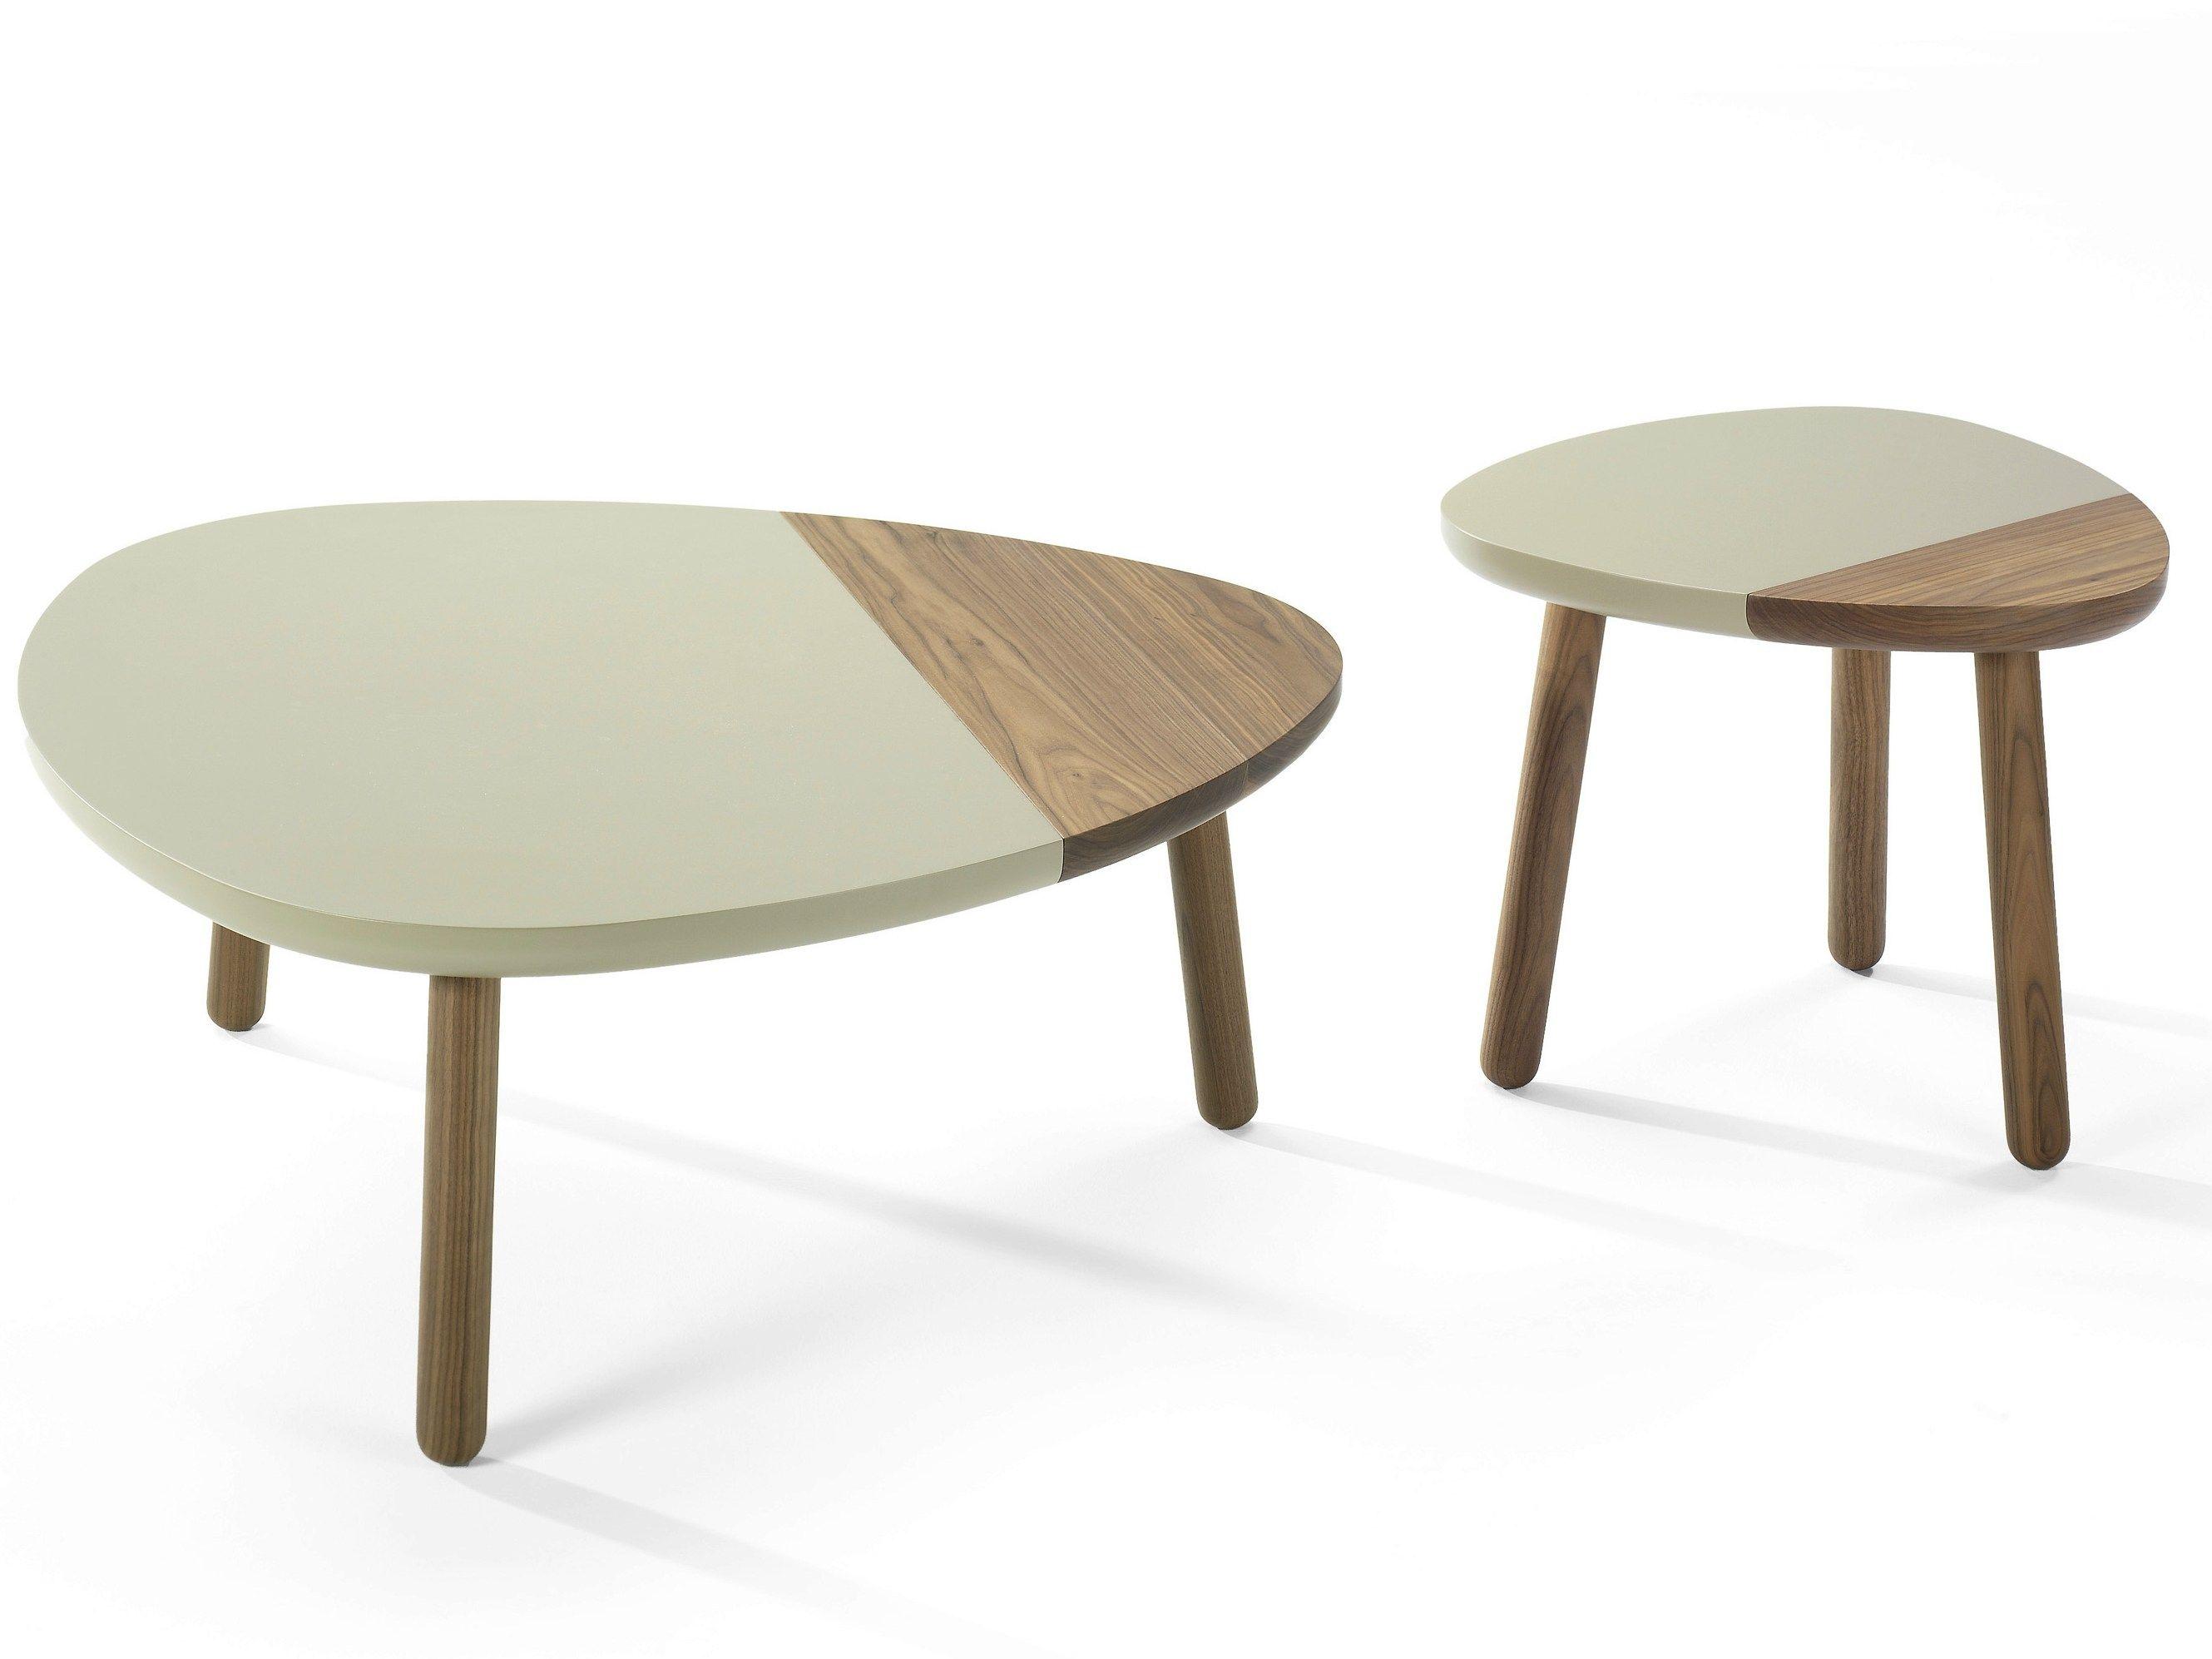 Lacquered Wooden Coffee Table Cami By Kendo Mobiliario Design Luis Alberto Arrivillaga